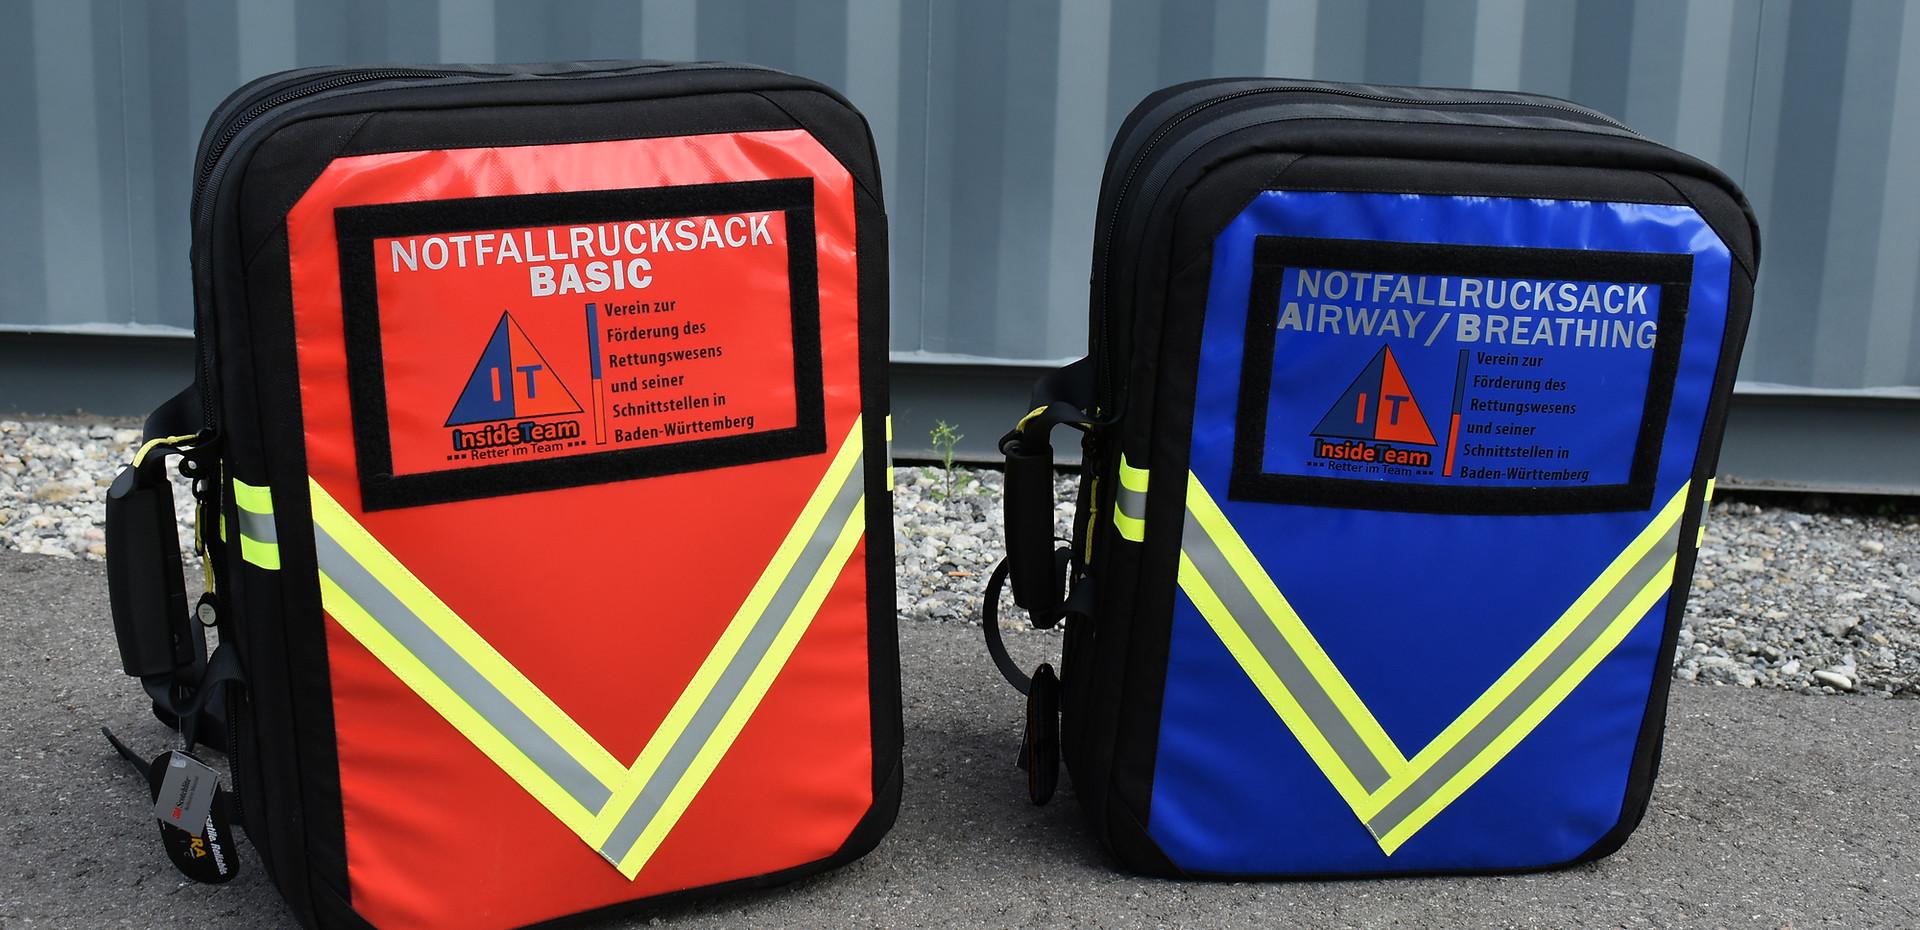 Notfallrucksäcke Basic und AB